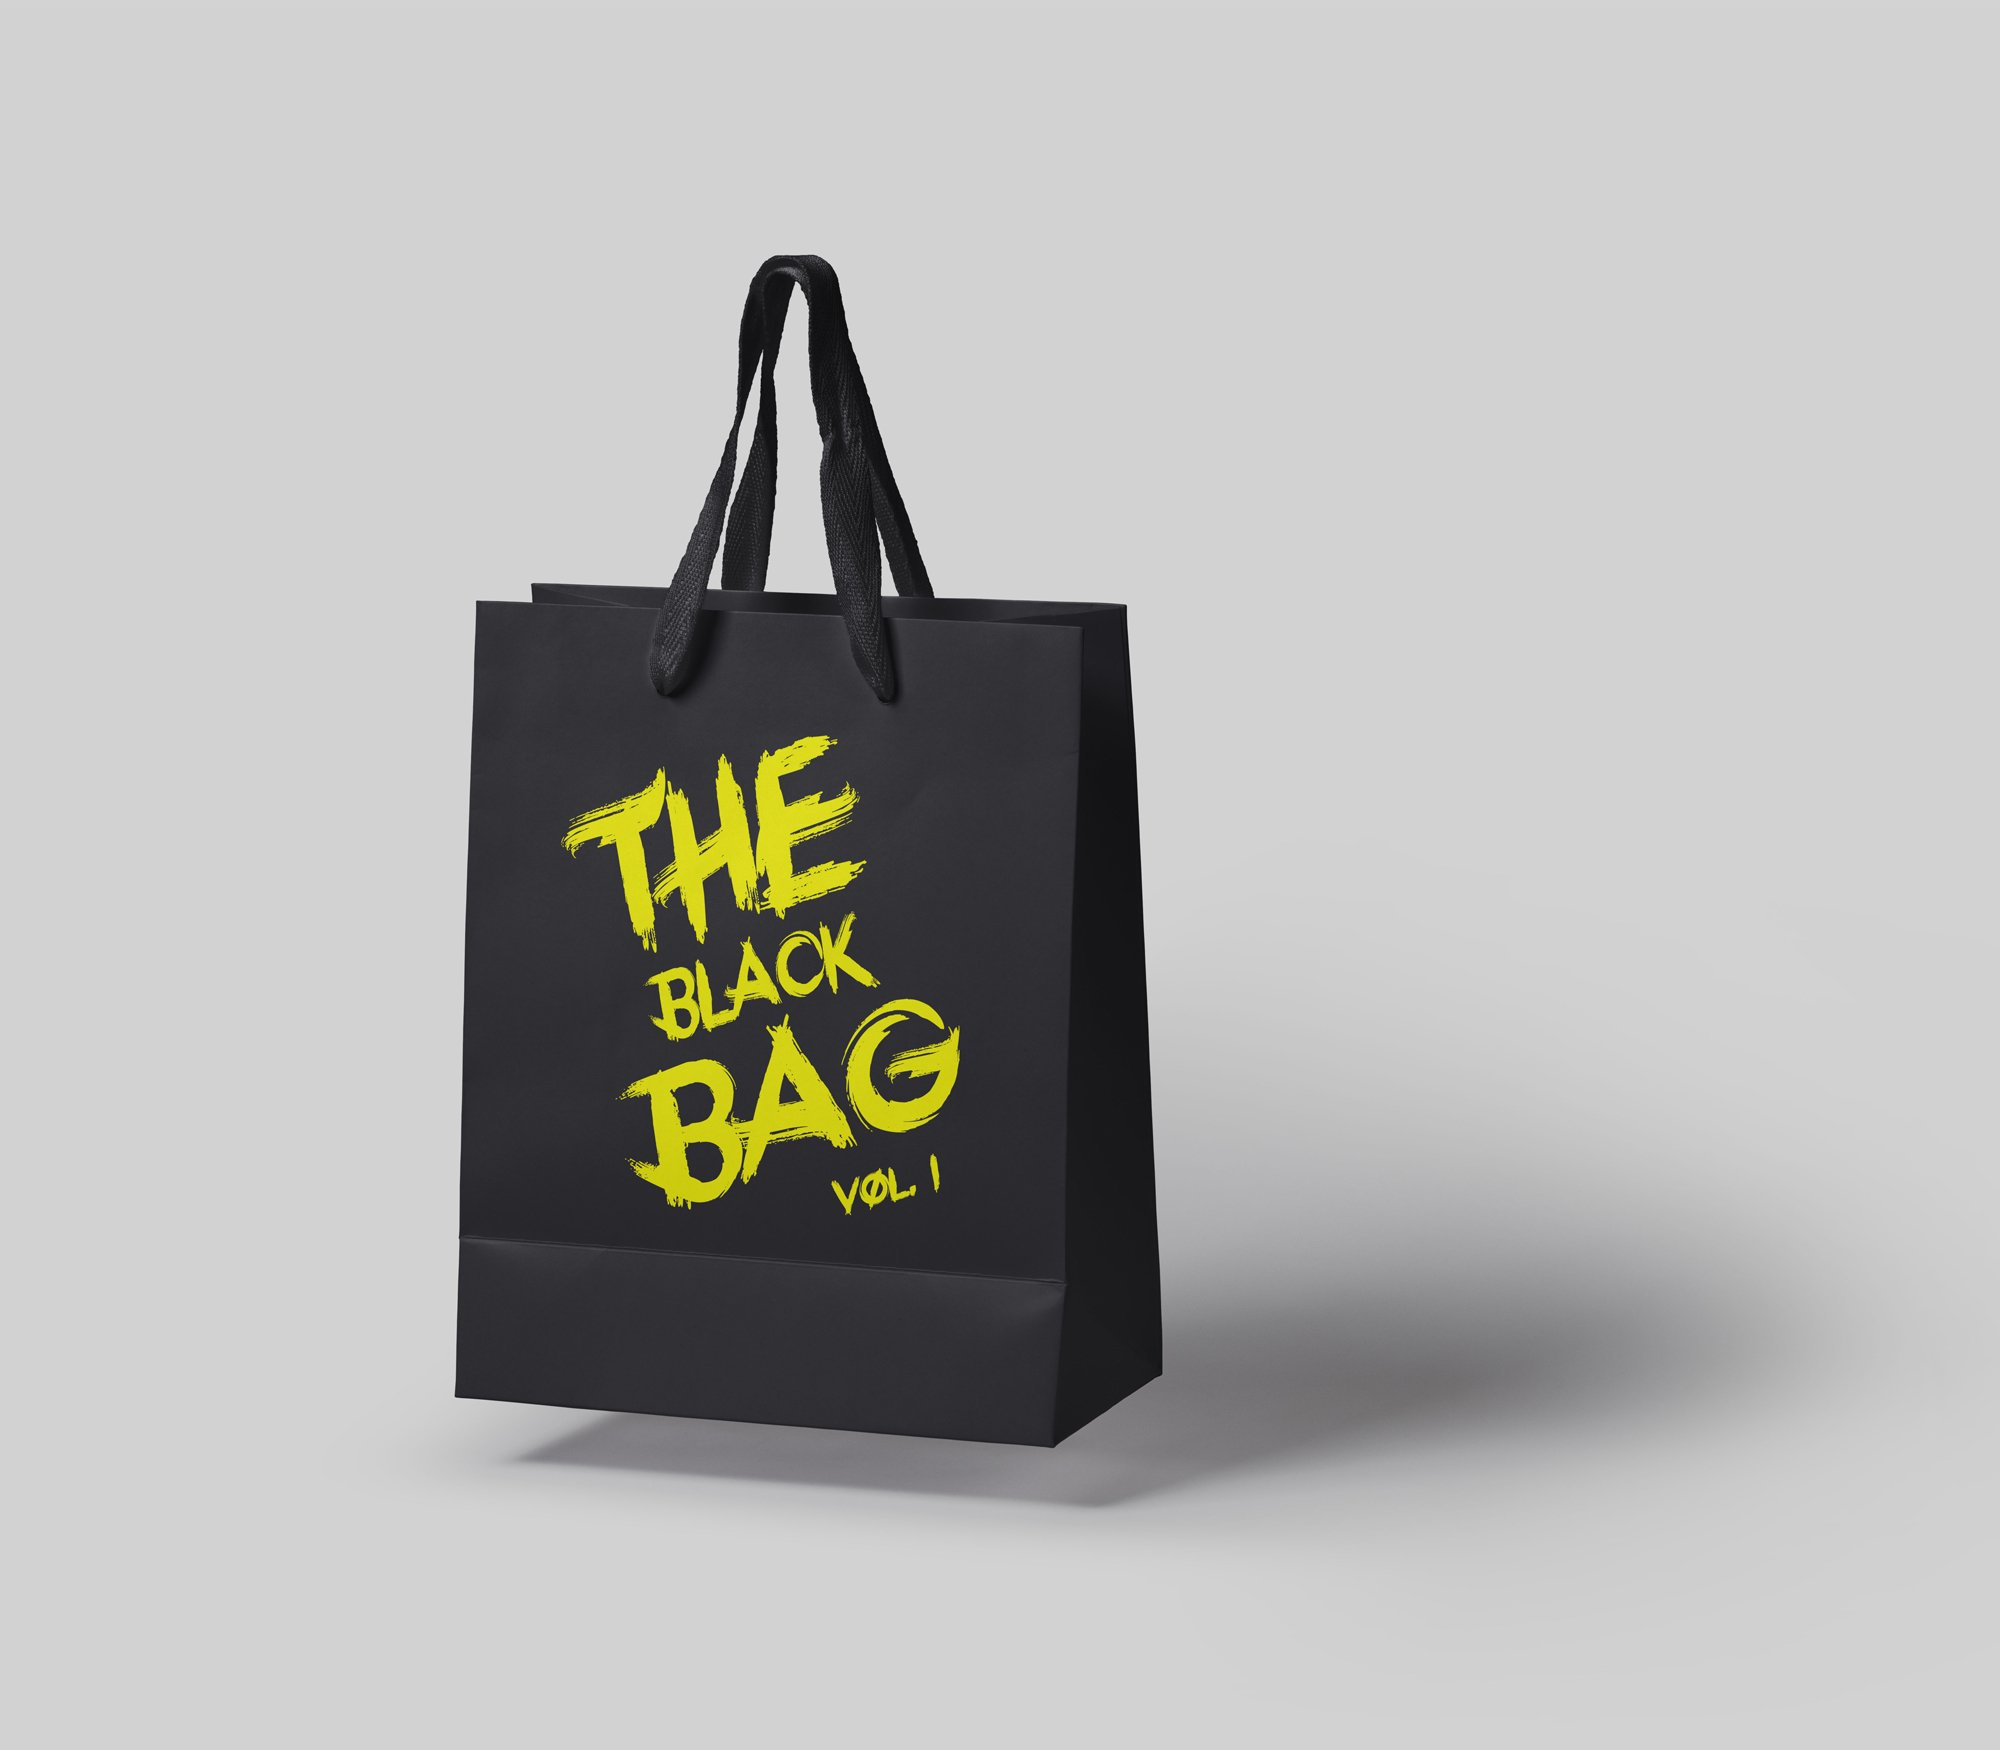 The Black Bag (Sample Pack Vol. 1)